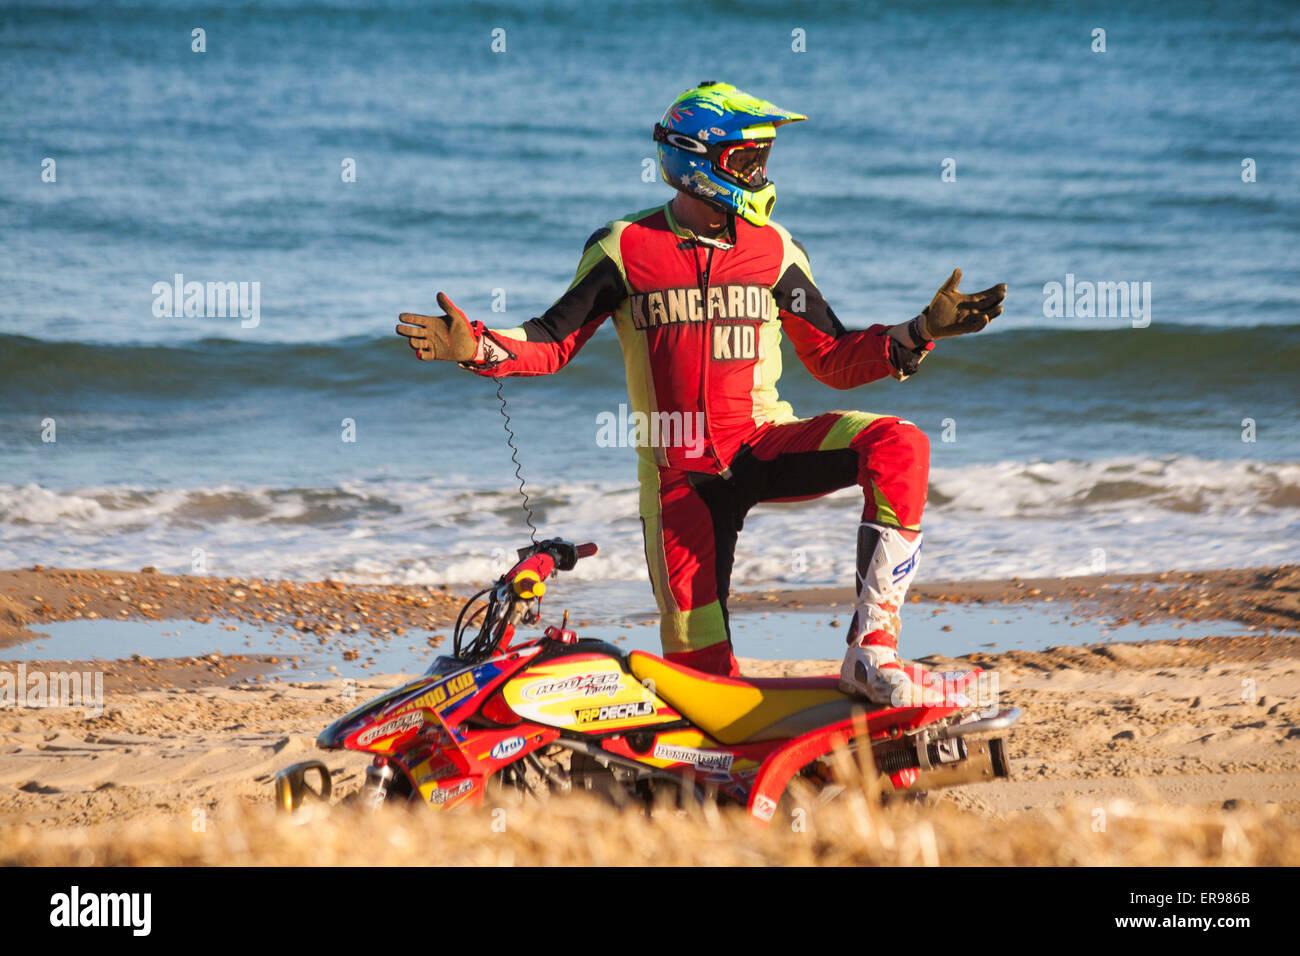 Bournemouth, UK 29 May 2015. The Australian stunt driver Kangaroo Kid (Matt Coulter), who makes his debut at the - Stock Image